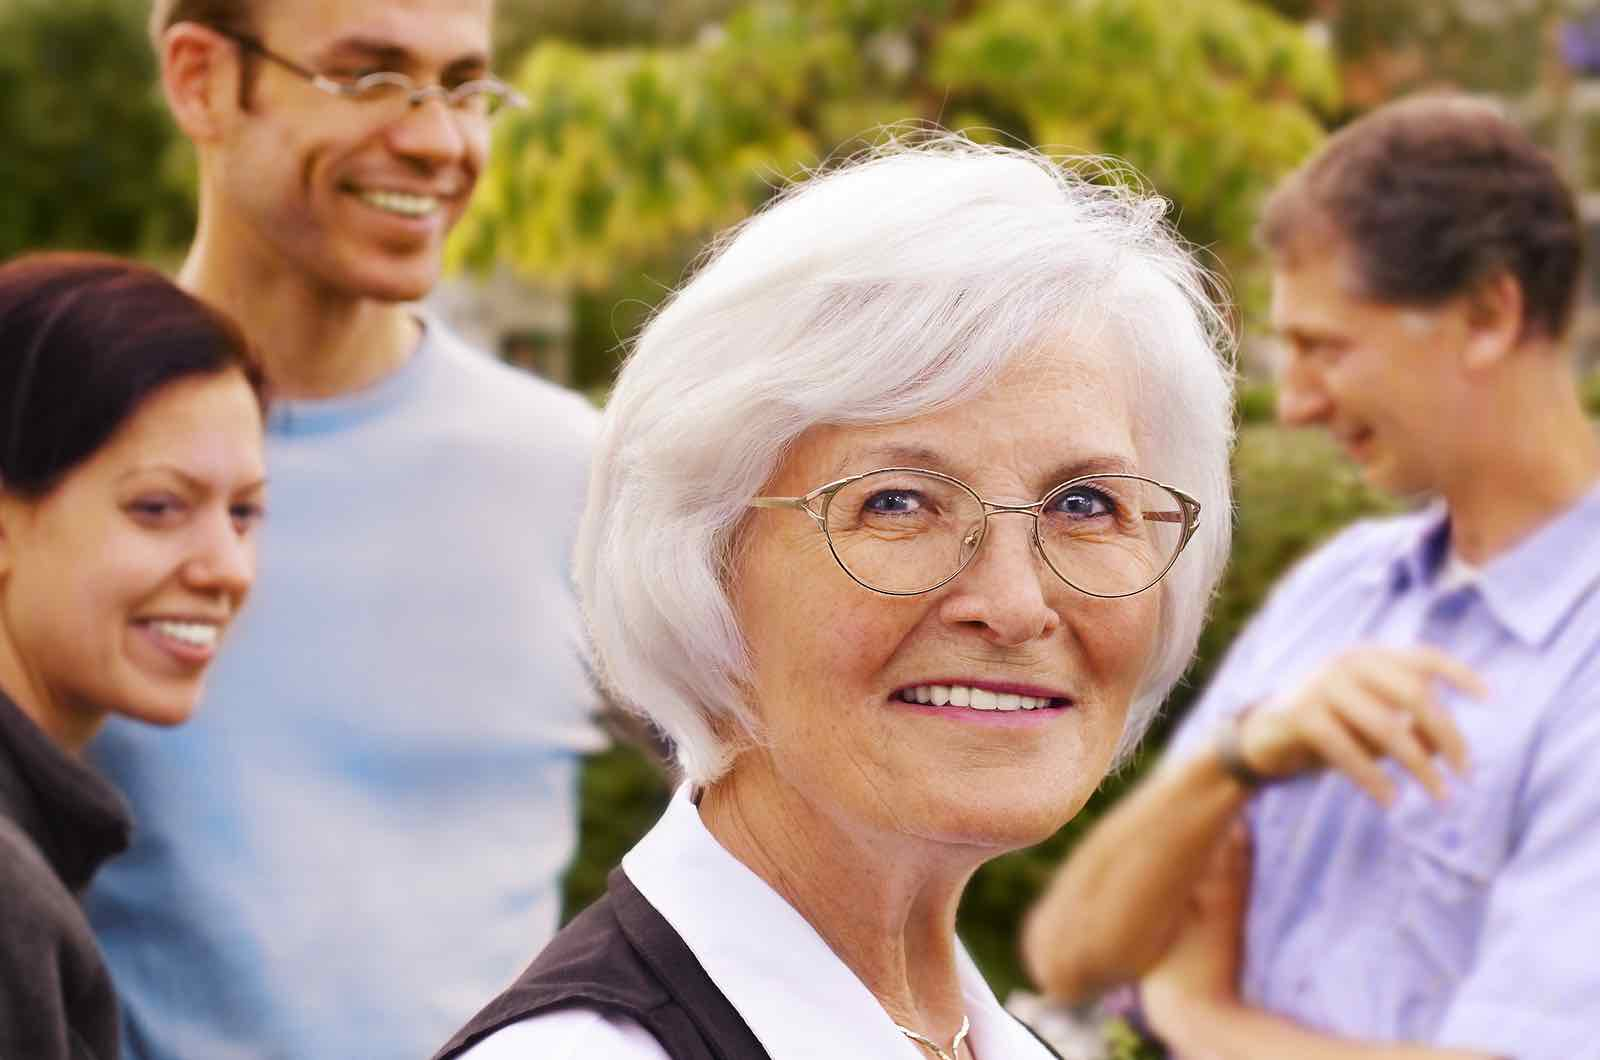 Elderly woman with dentures in Bellaire, TX.